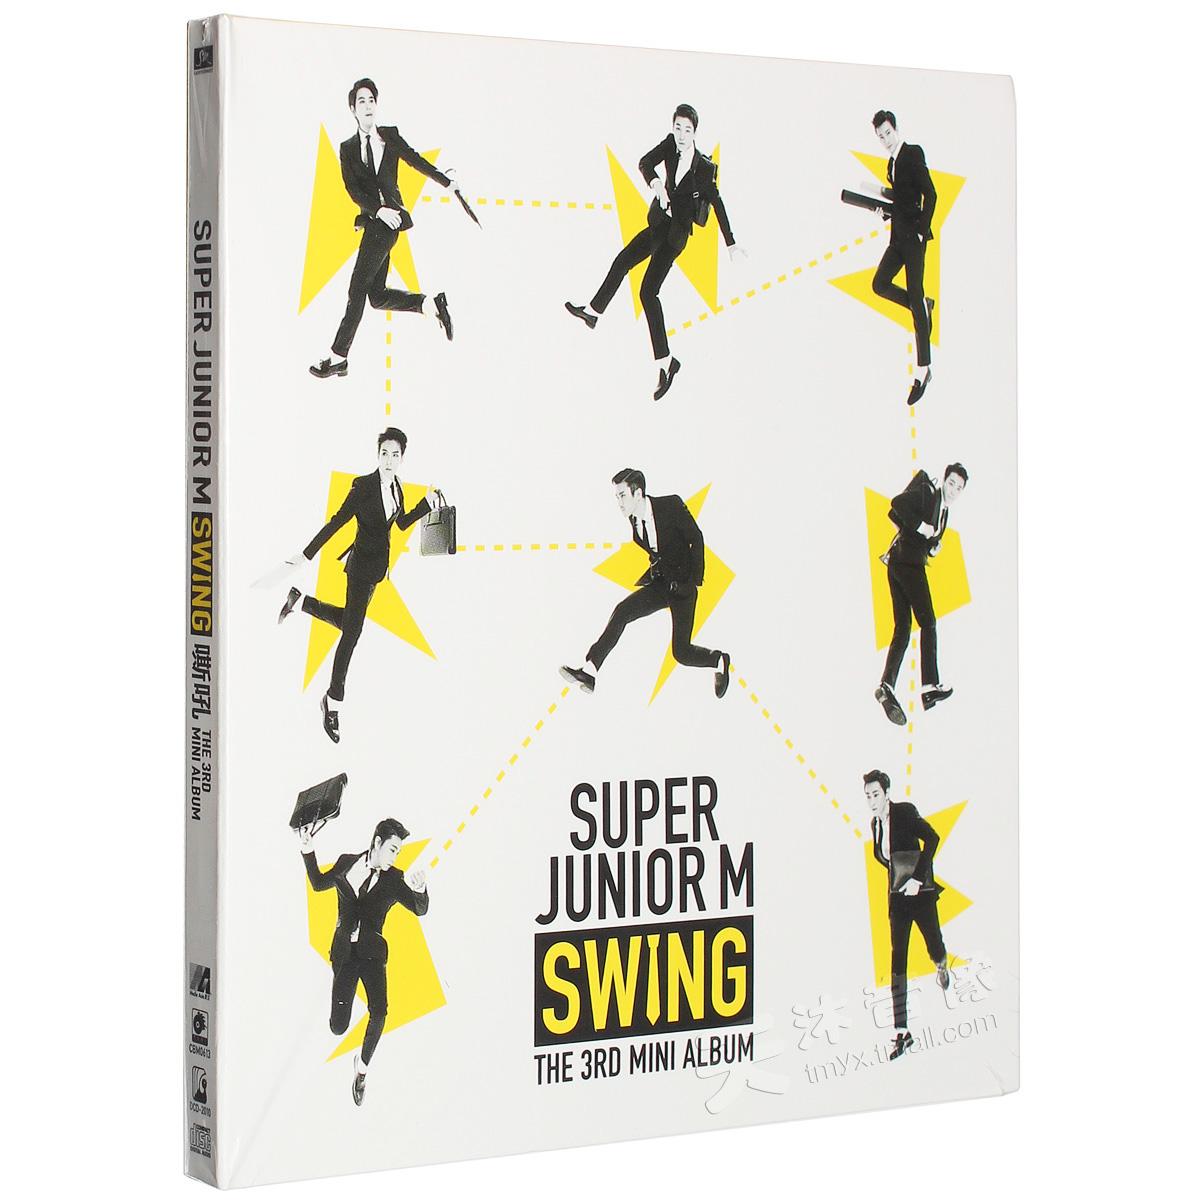 Super Junior-M SWING 嘶吼 2014專輯 CD+簽名小卡+寫真集-百雅音像